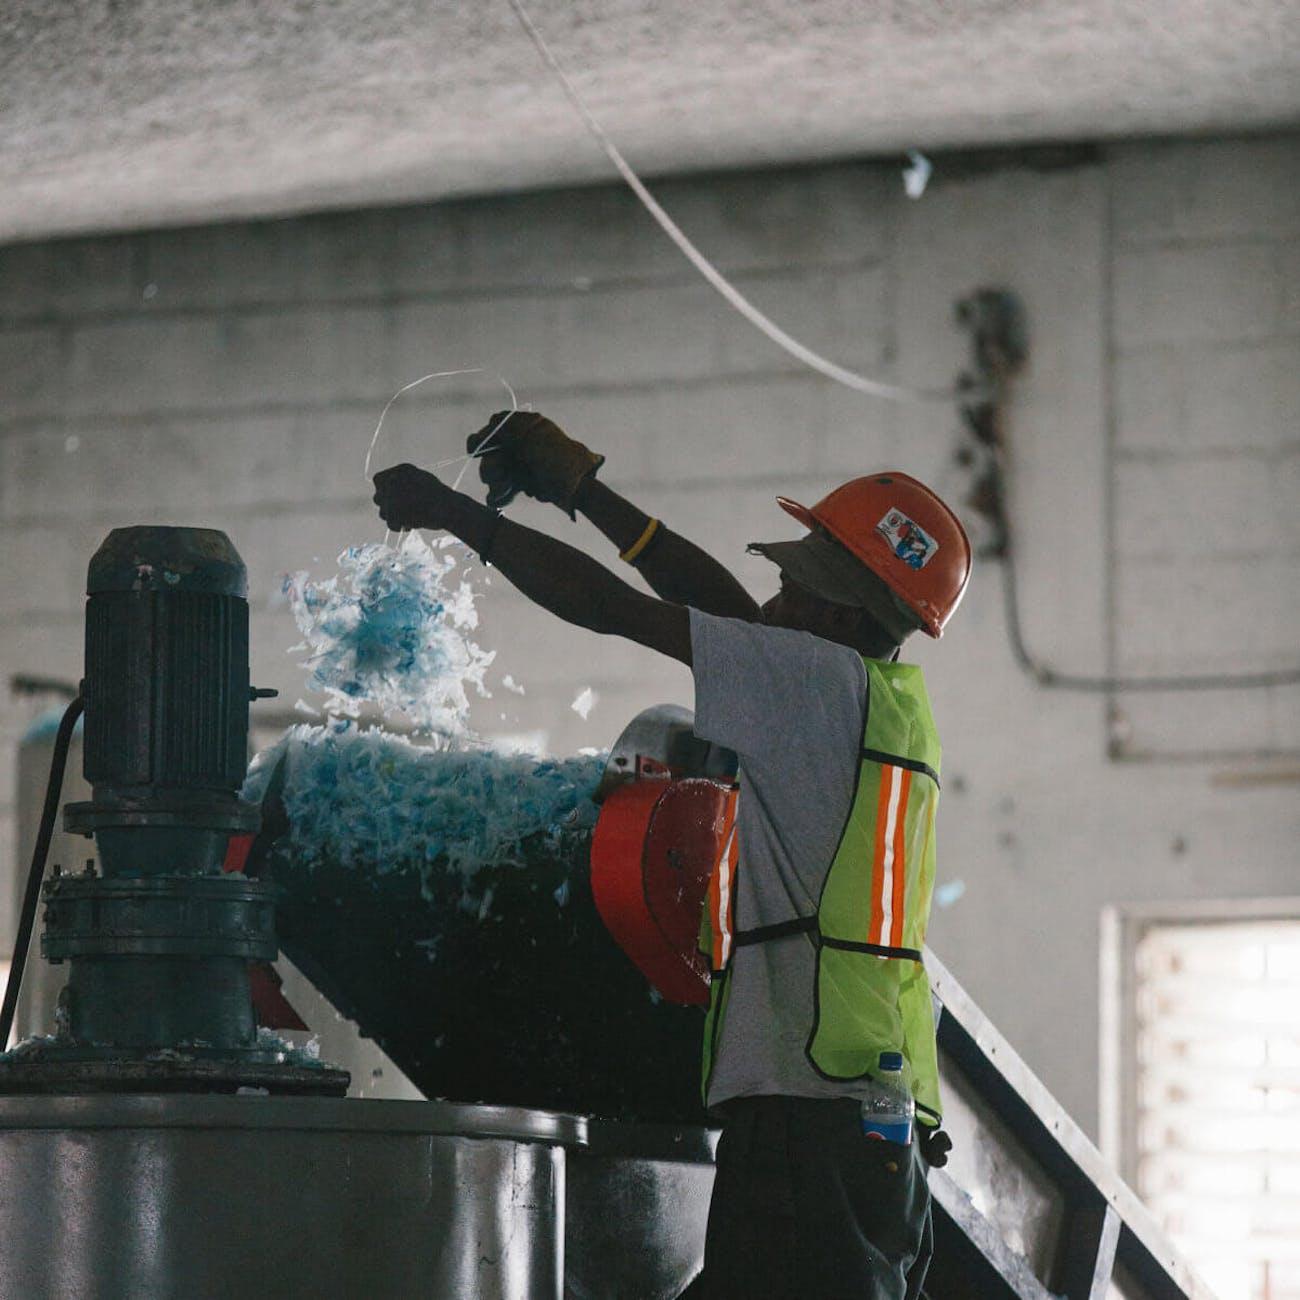 Processing the plastic.